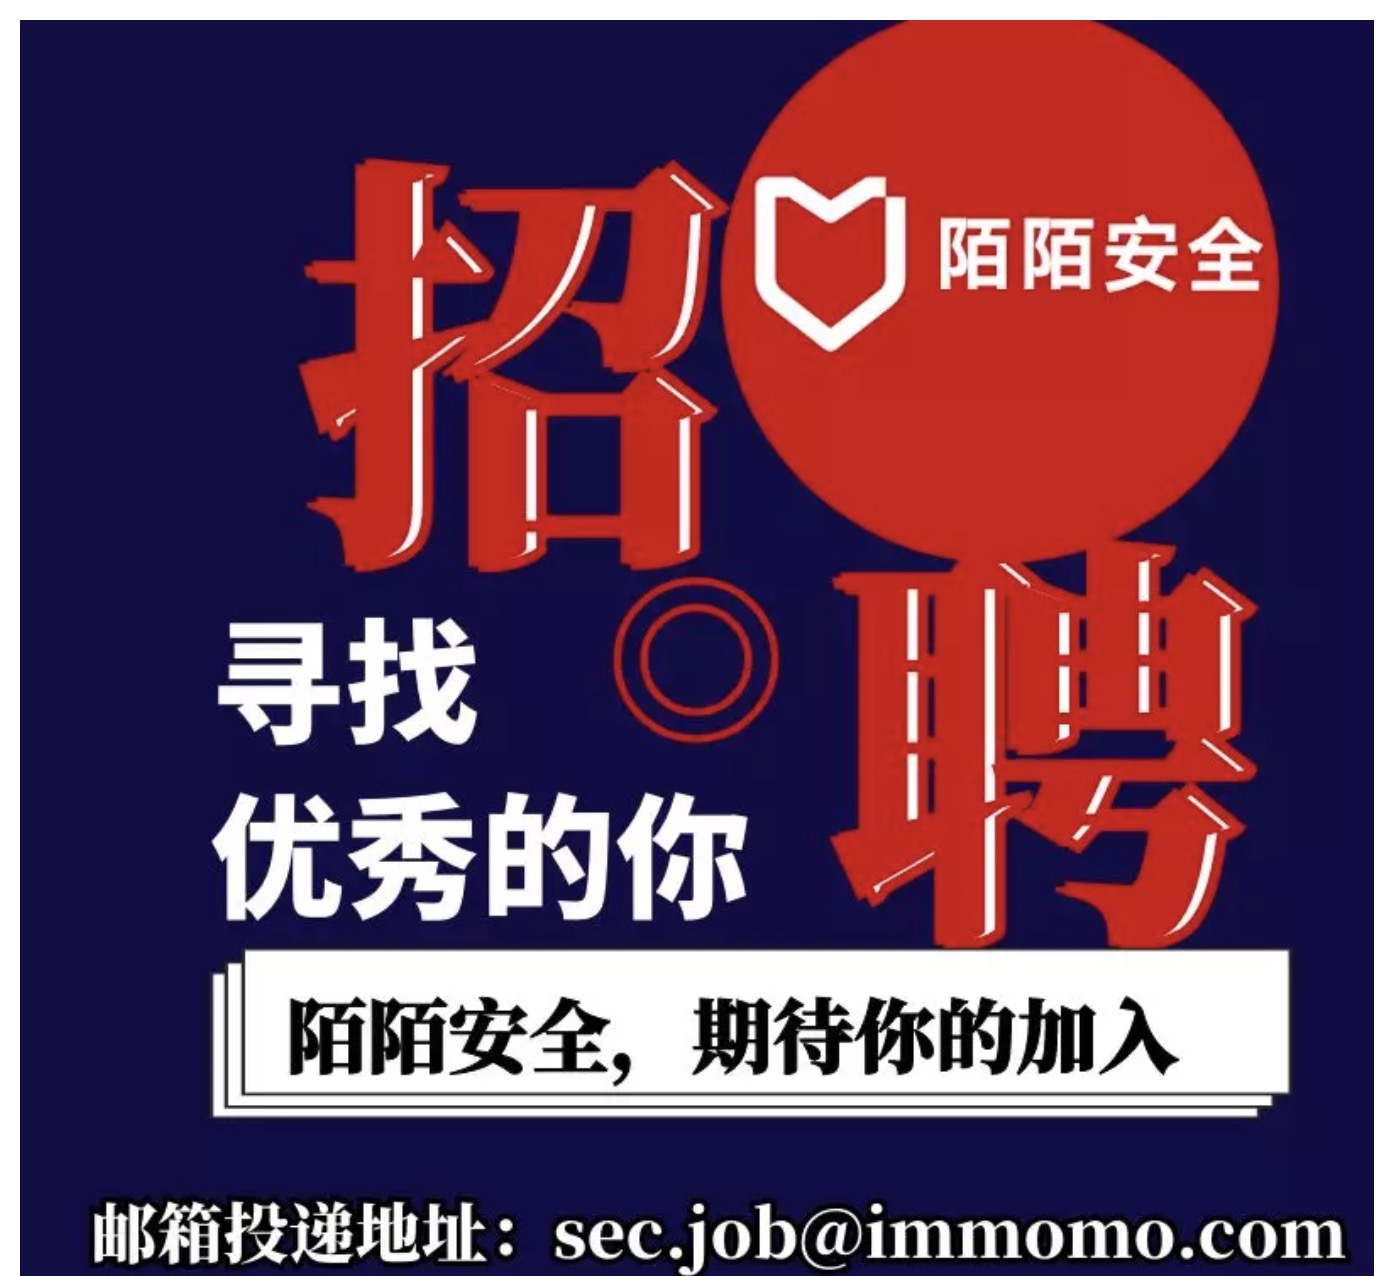 https://momo-mmsrc.oss-cn-hangzhou.aliyuncs.com/img-c8443d8e-ef16-359e-90bf-d18c7c77054a.jpeg